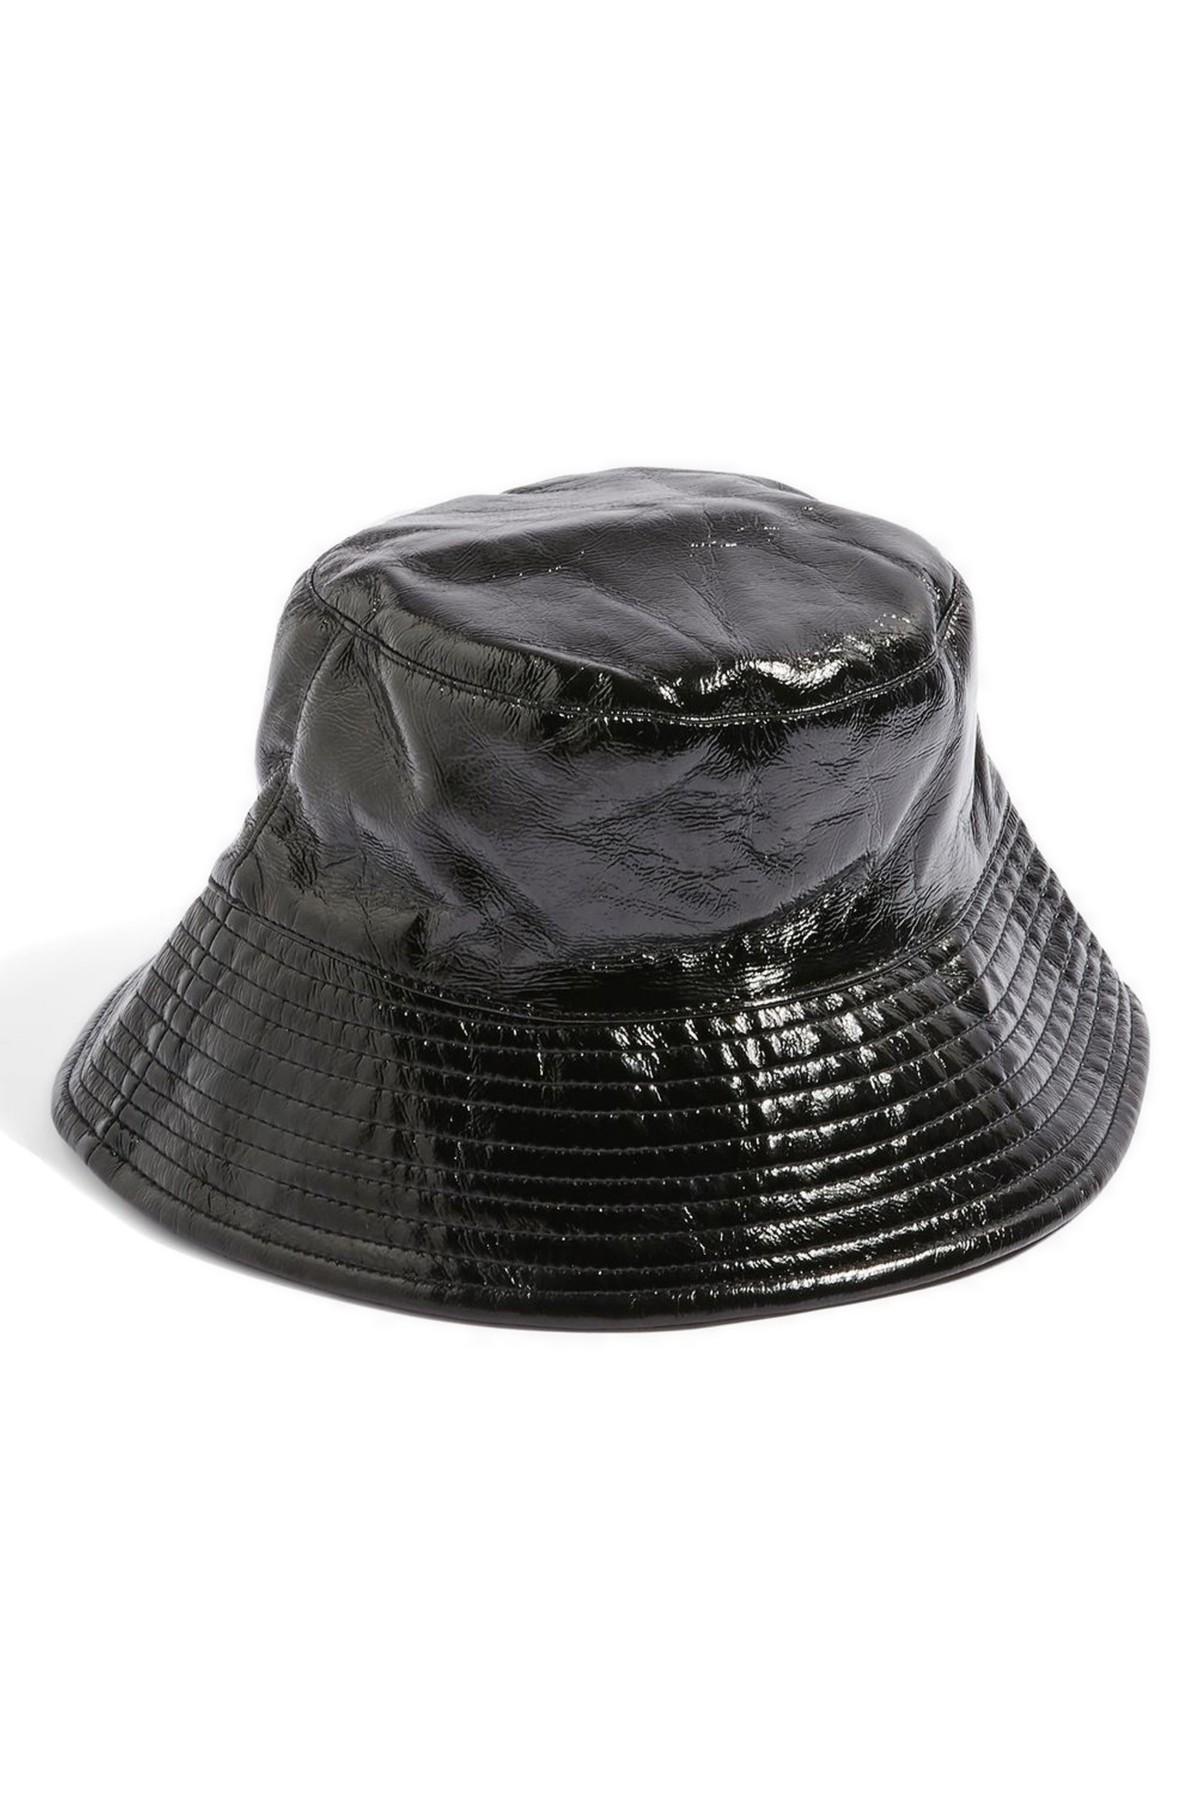 ebf4189341258 TOPSHOP Vinyl Bucket Hat in Black - Lyst